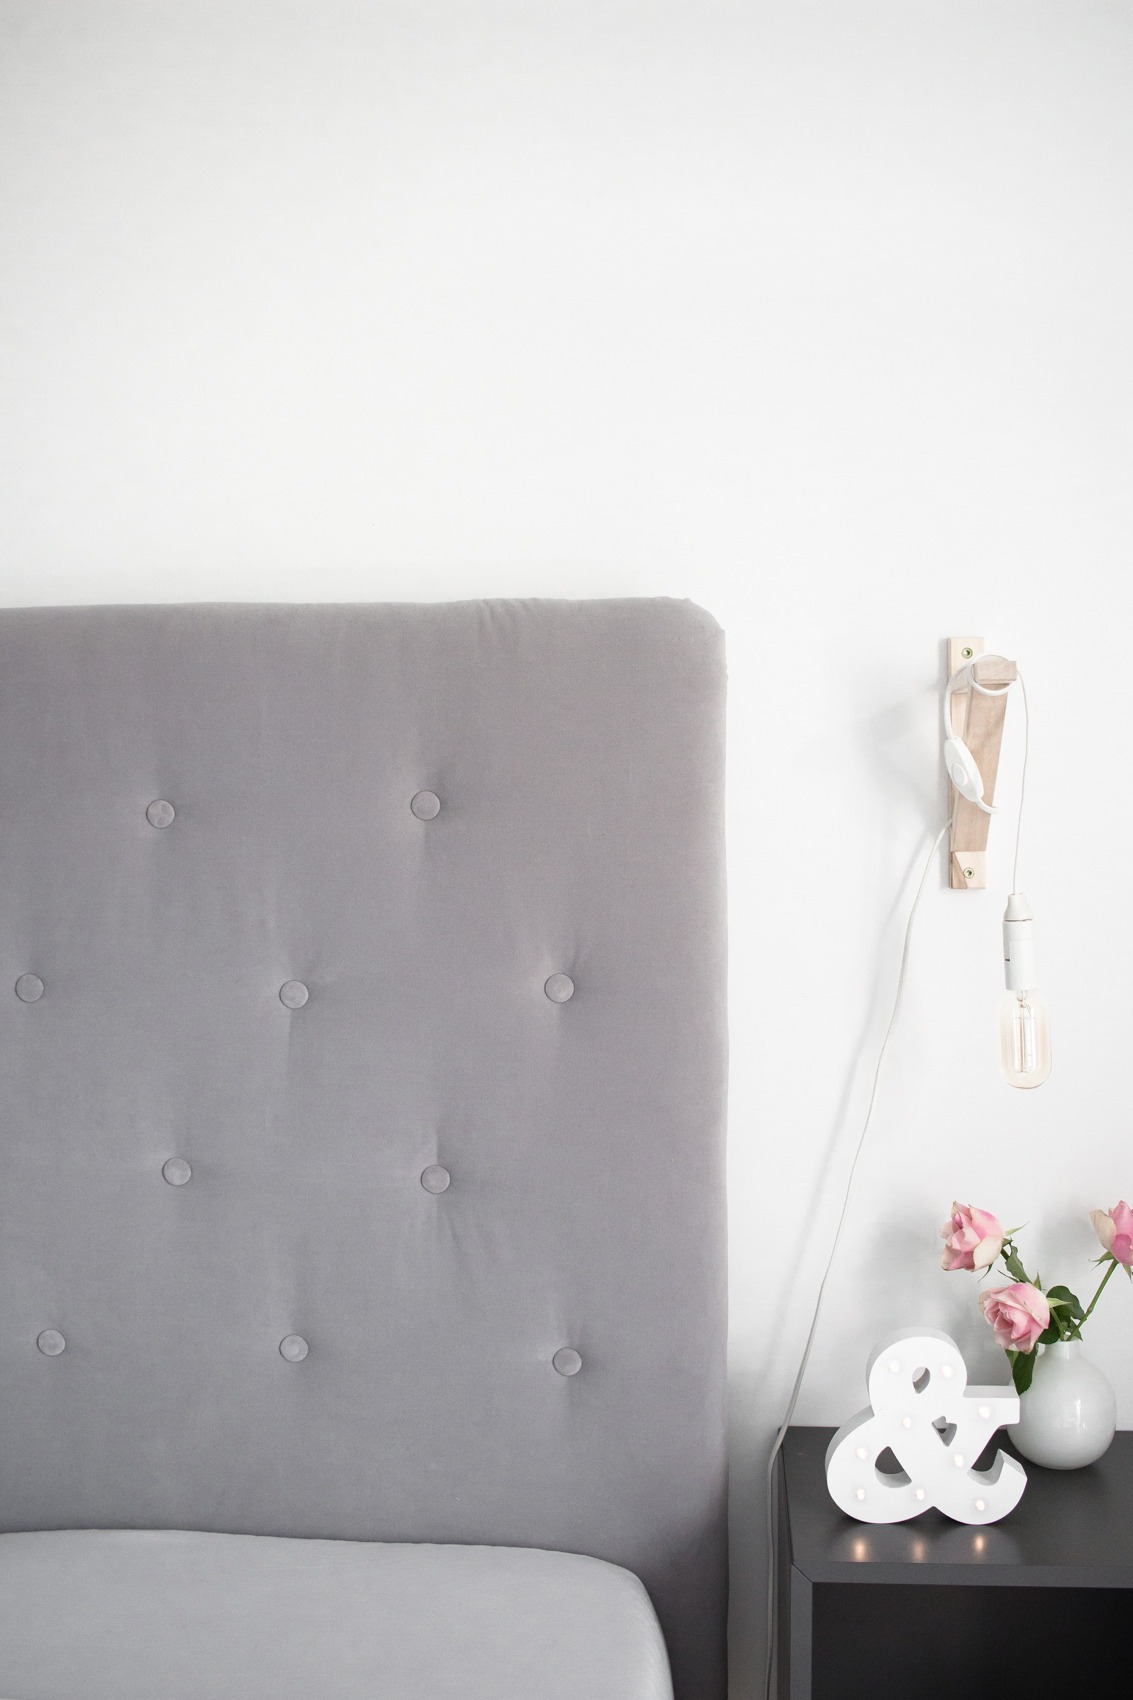 Diy Kopfteil Bett Selfmade Grau Samt Chesterfield Look 33 Puppenzirkus